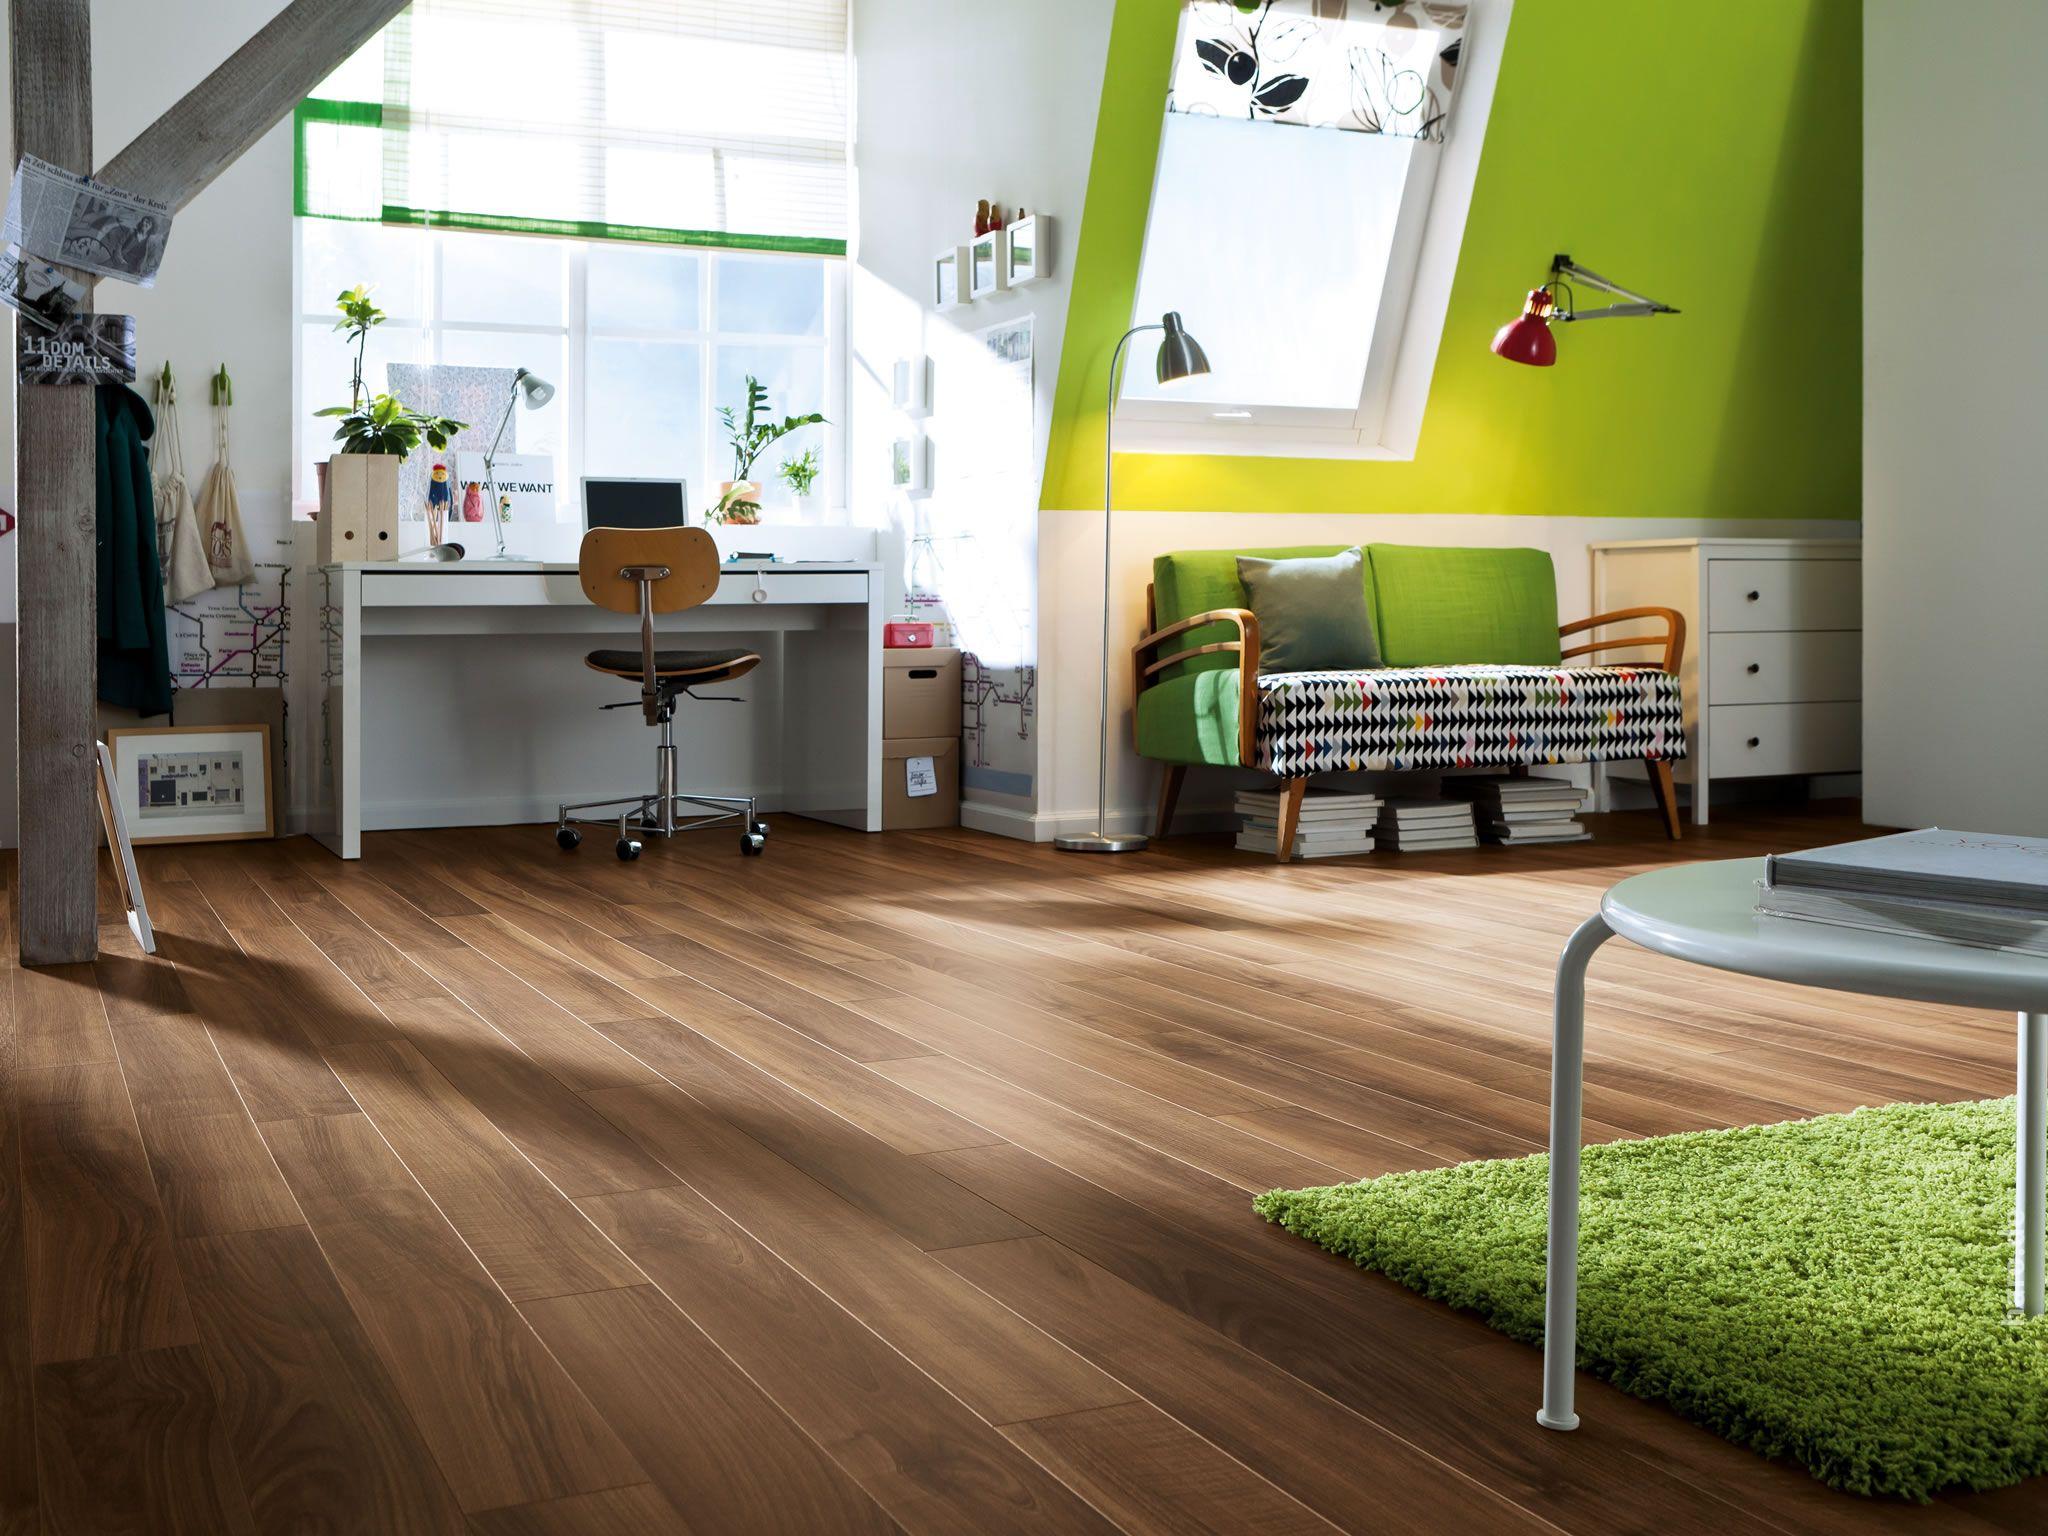 Wohnzimmer Laminat ~ 35 best laminate floor laminat images on pinterest living room